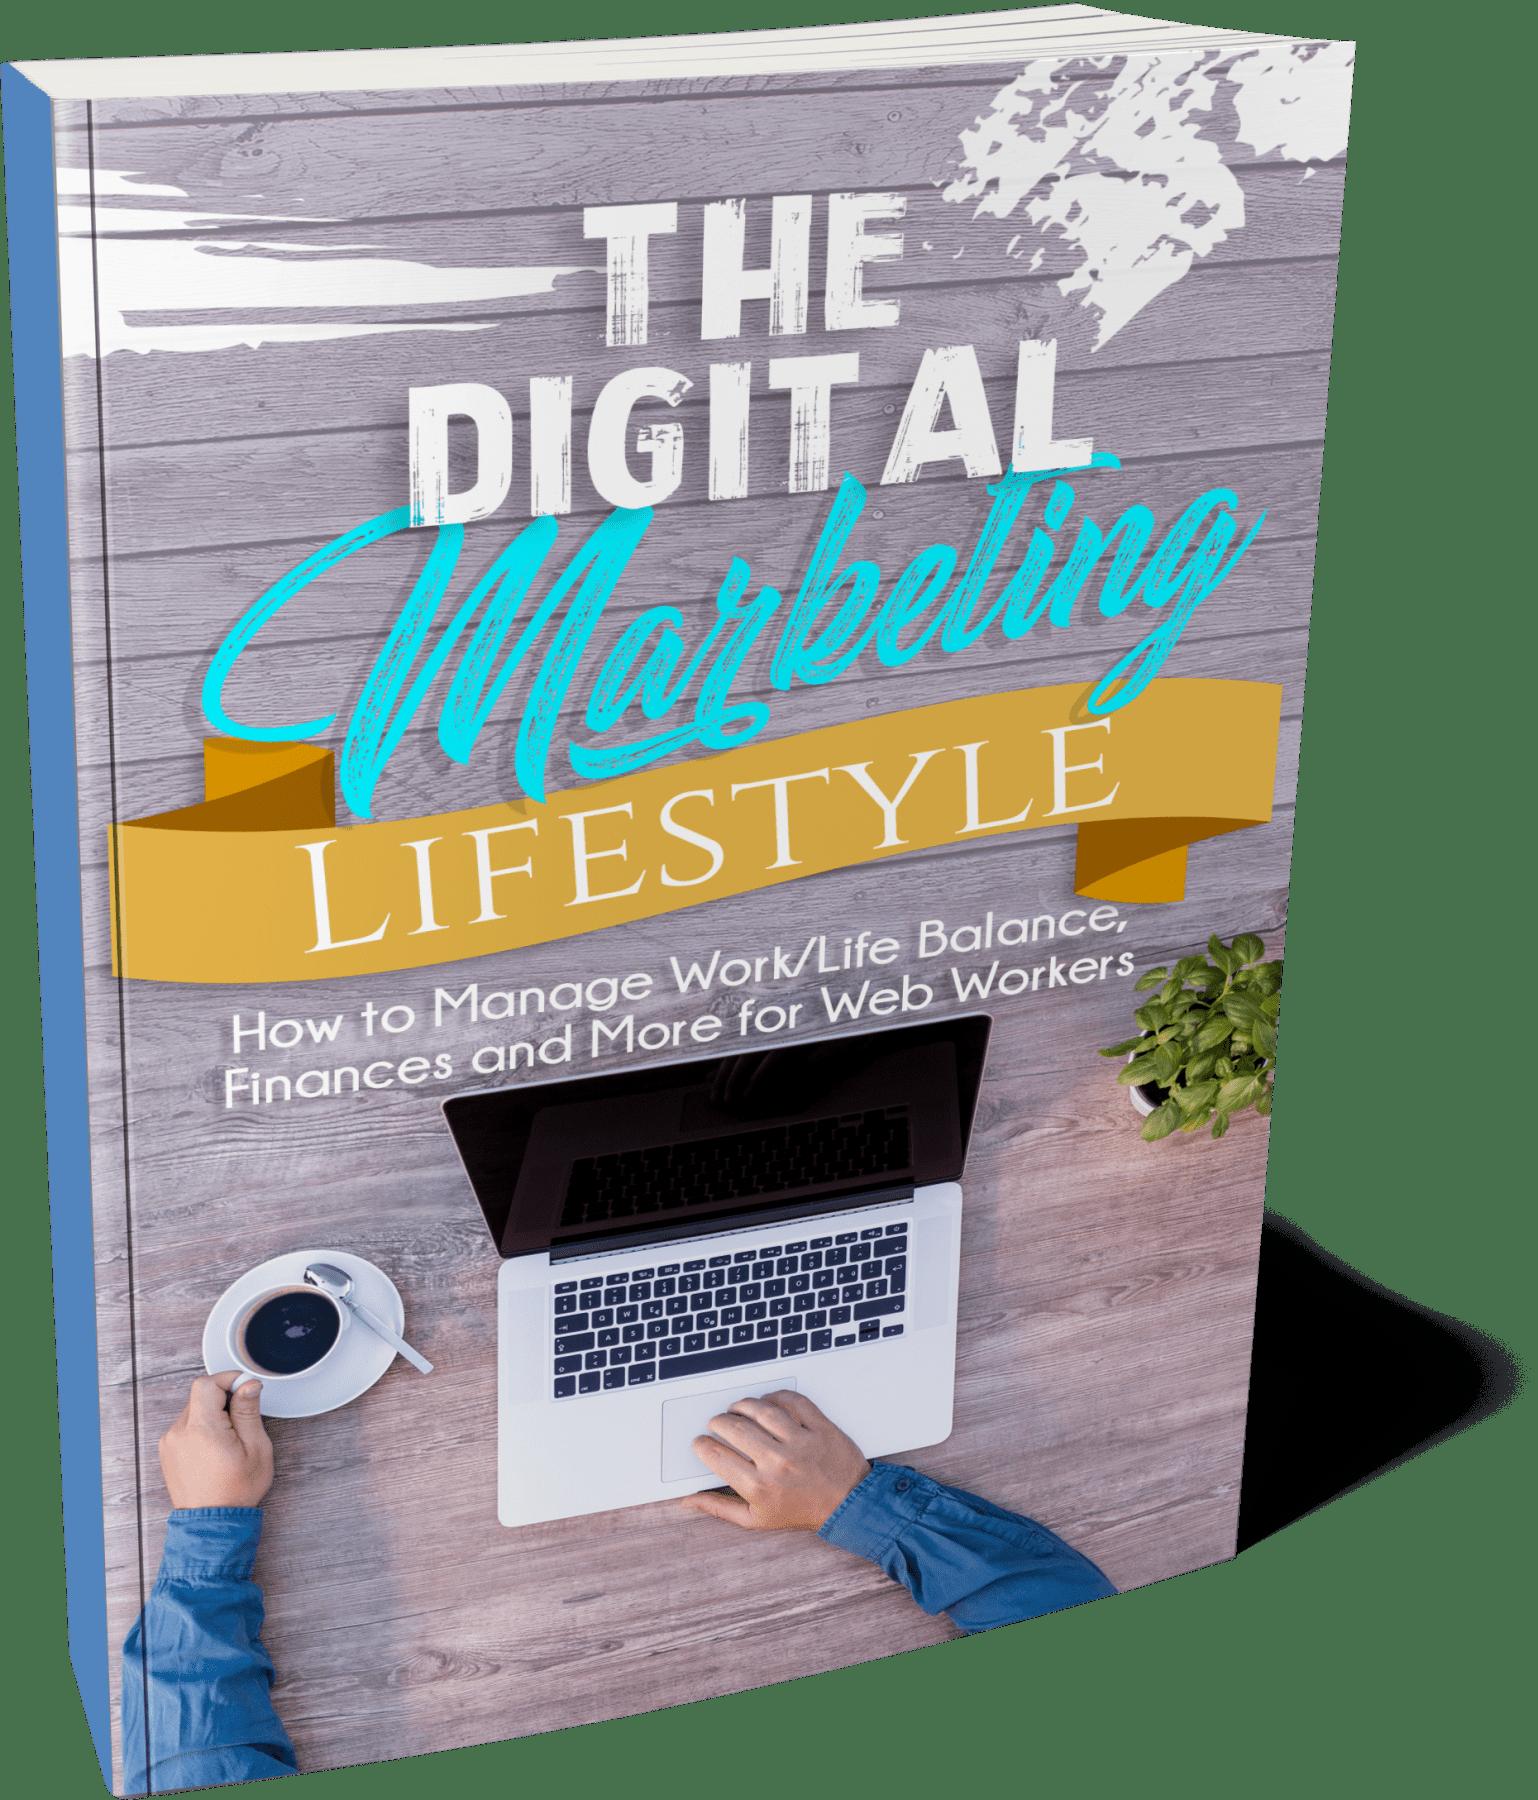 The Digital Marketing Lifestyle